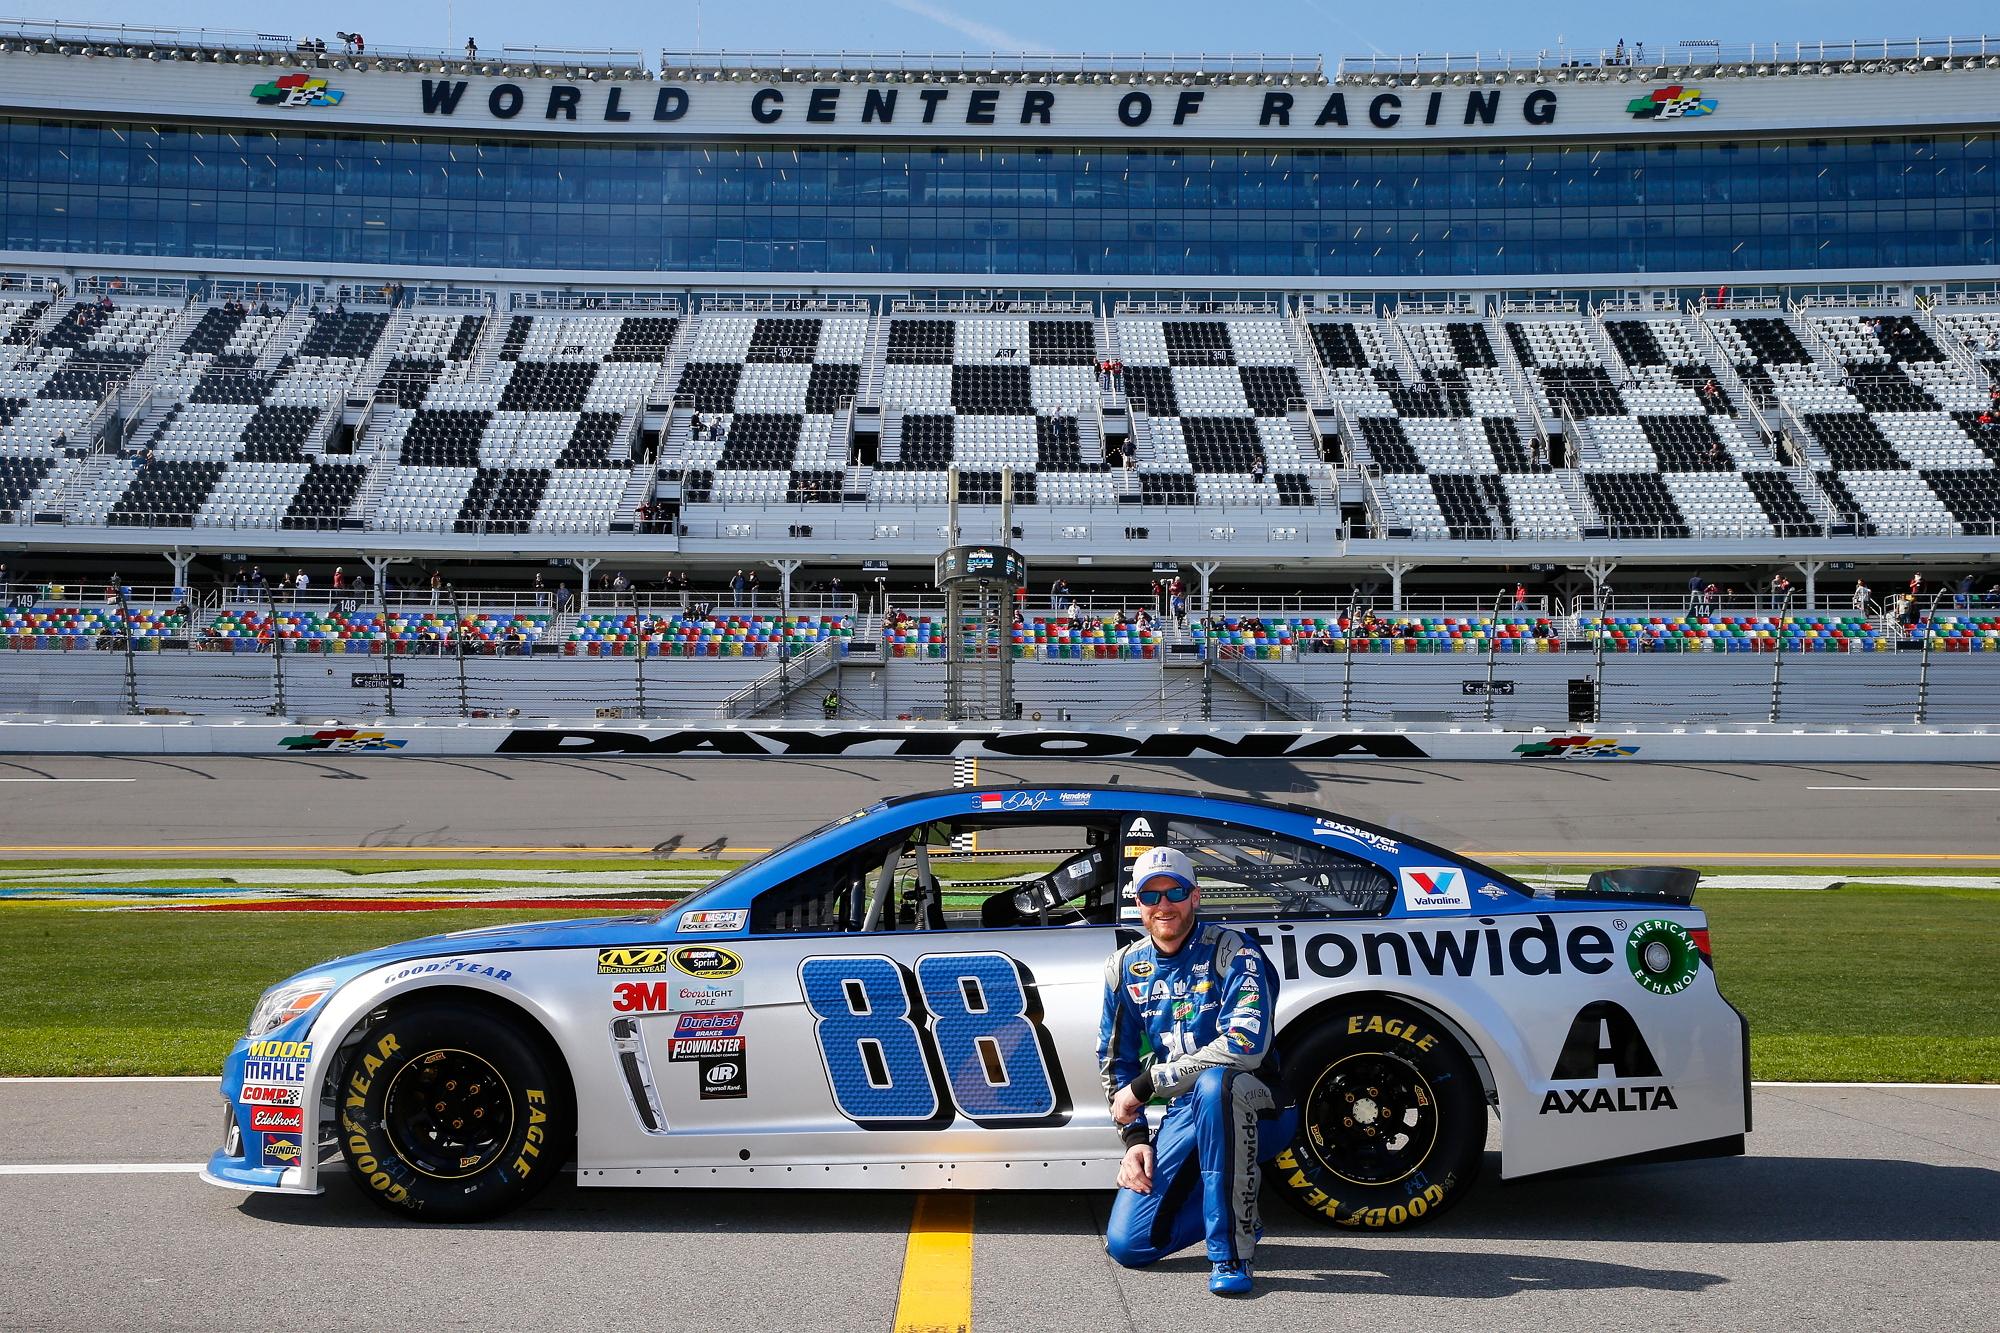 a NASCAR driver kneeling by a race car